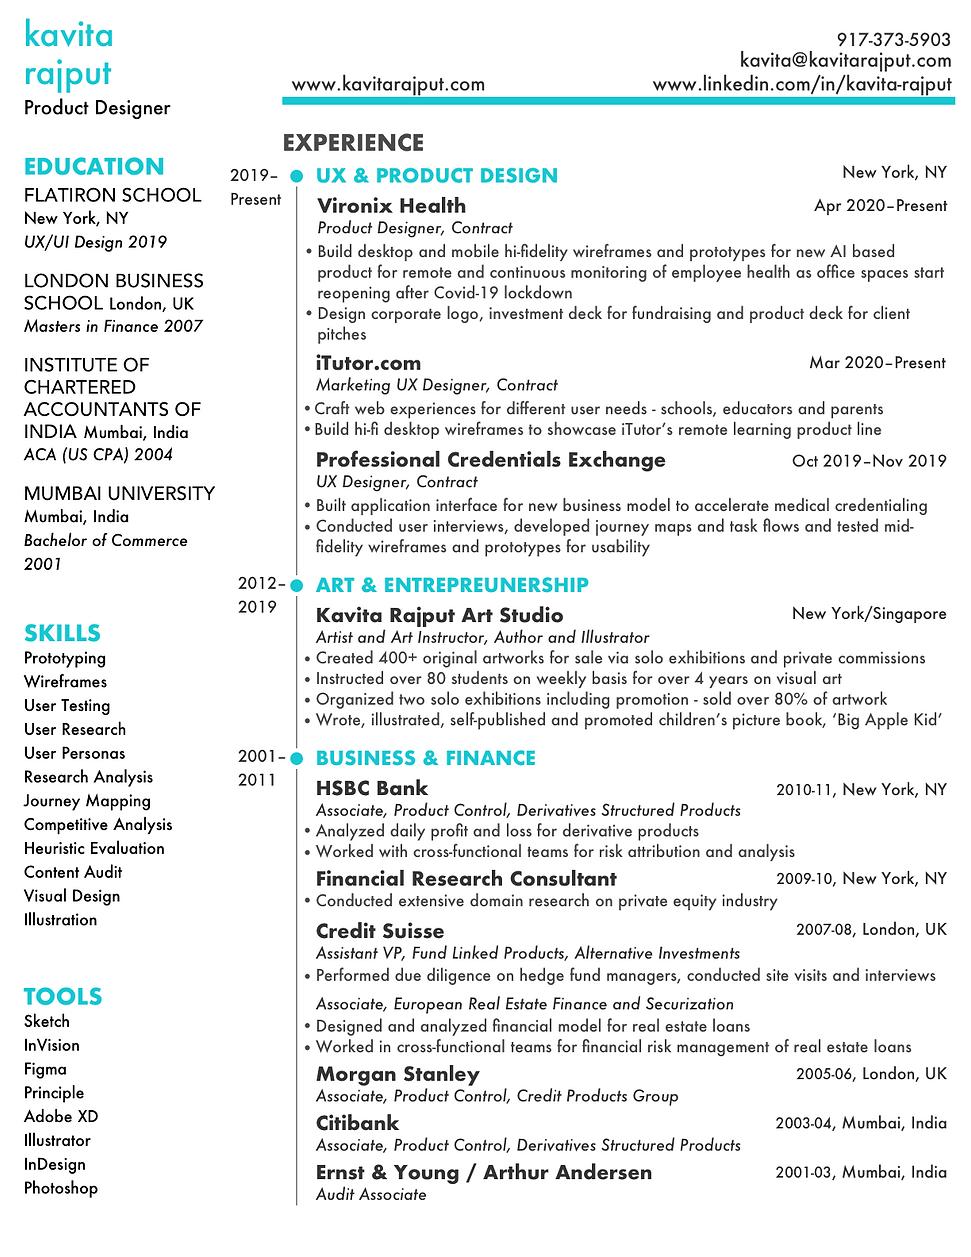 Kavita Rajput Resume.png